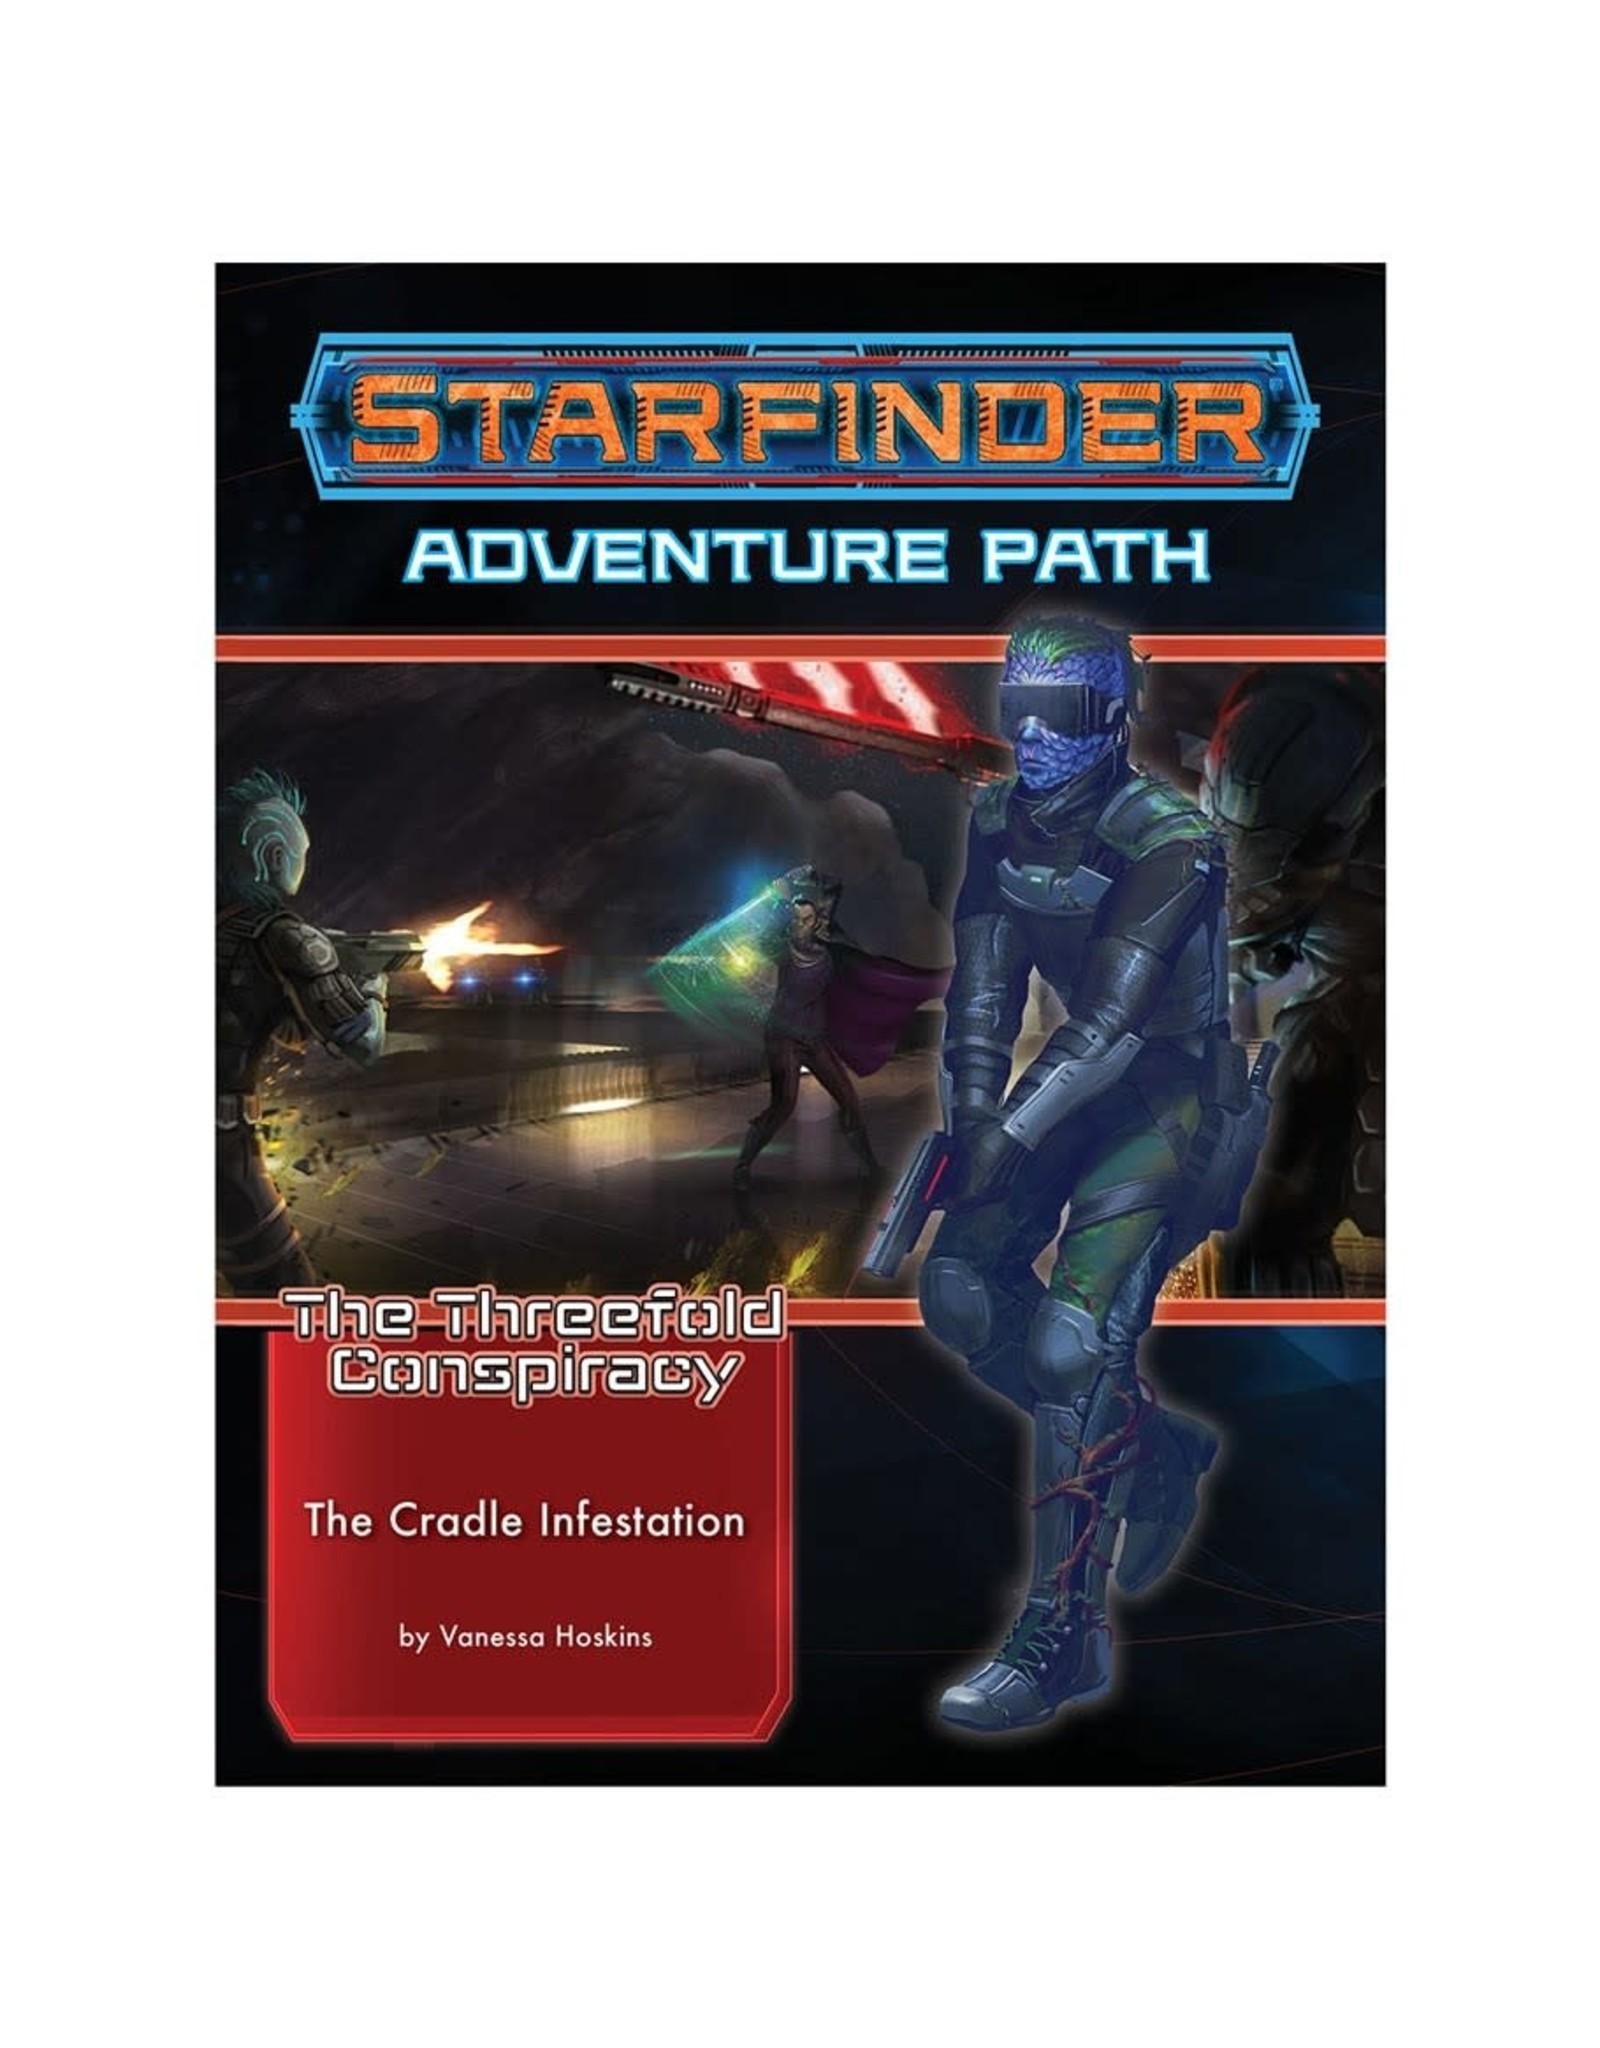 Paizo Starfinder Adventure Path: The Threefold Conspiracy 5 - The Cradle Infestation